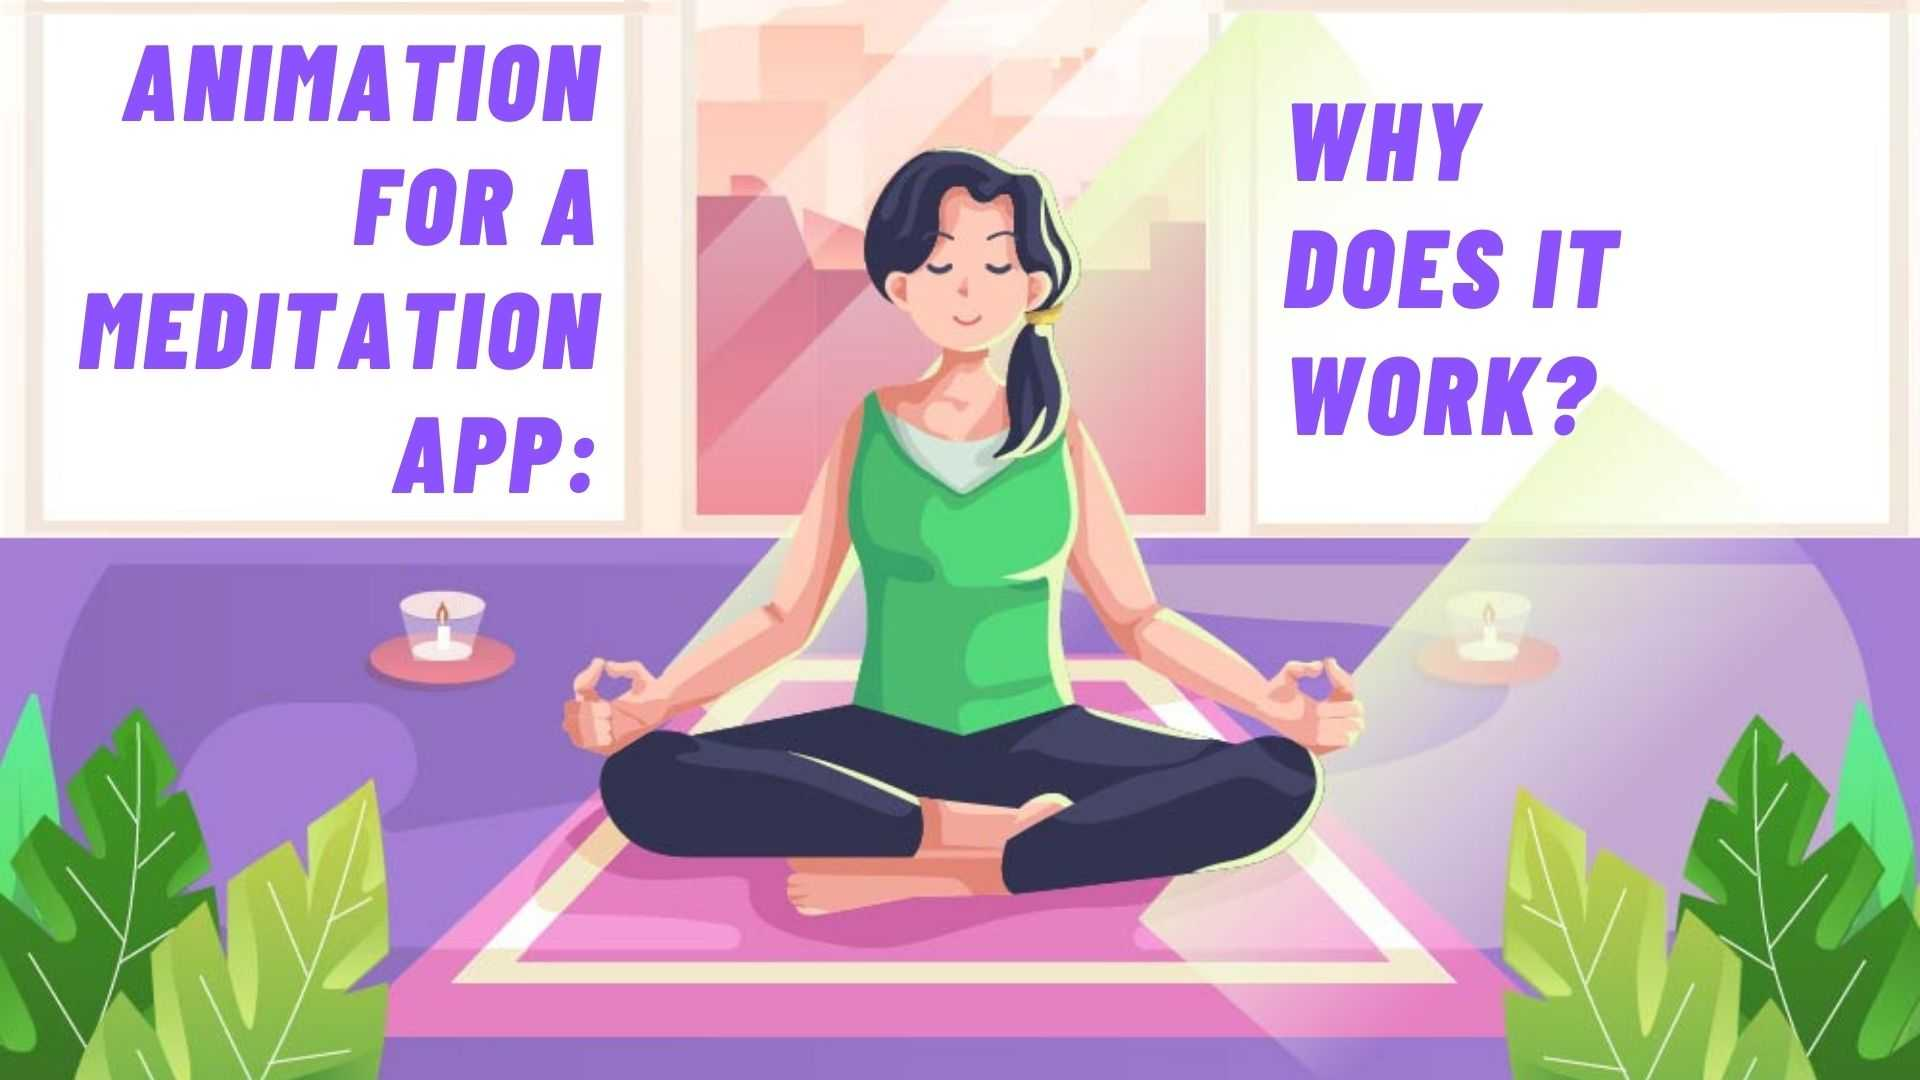 Meditation with meditation applications